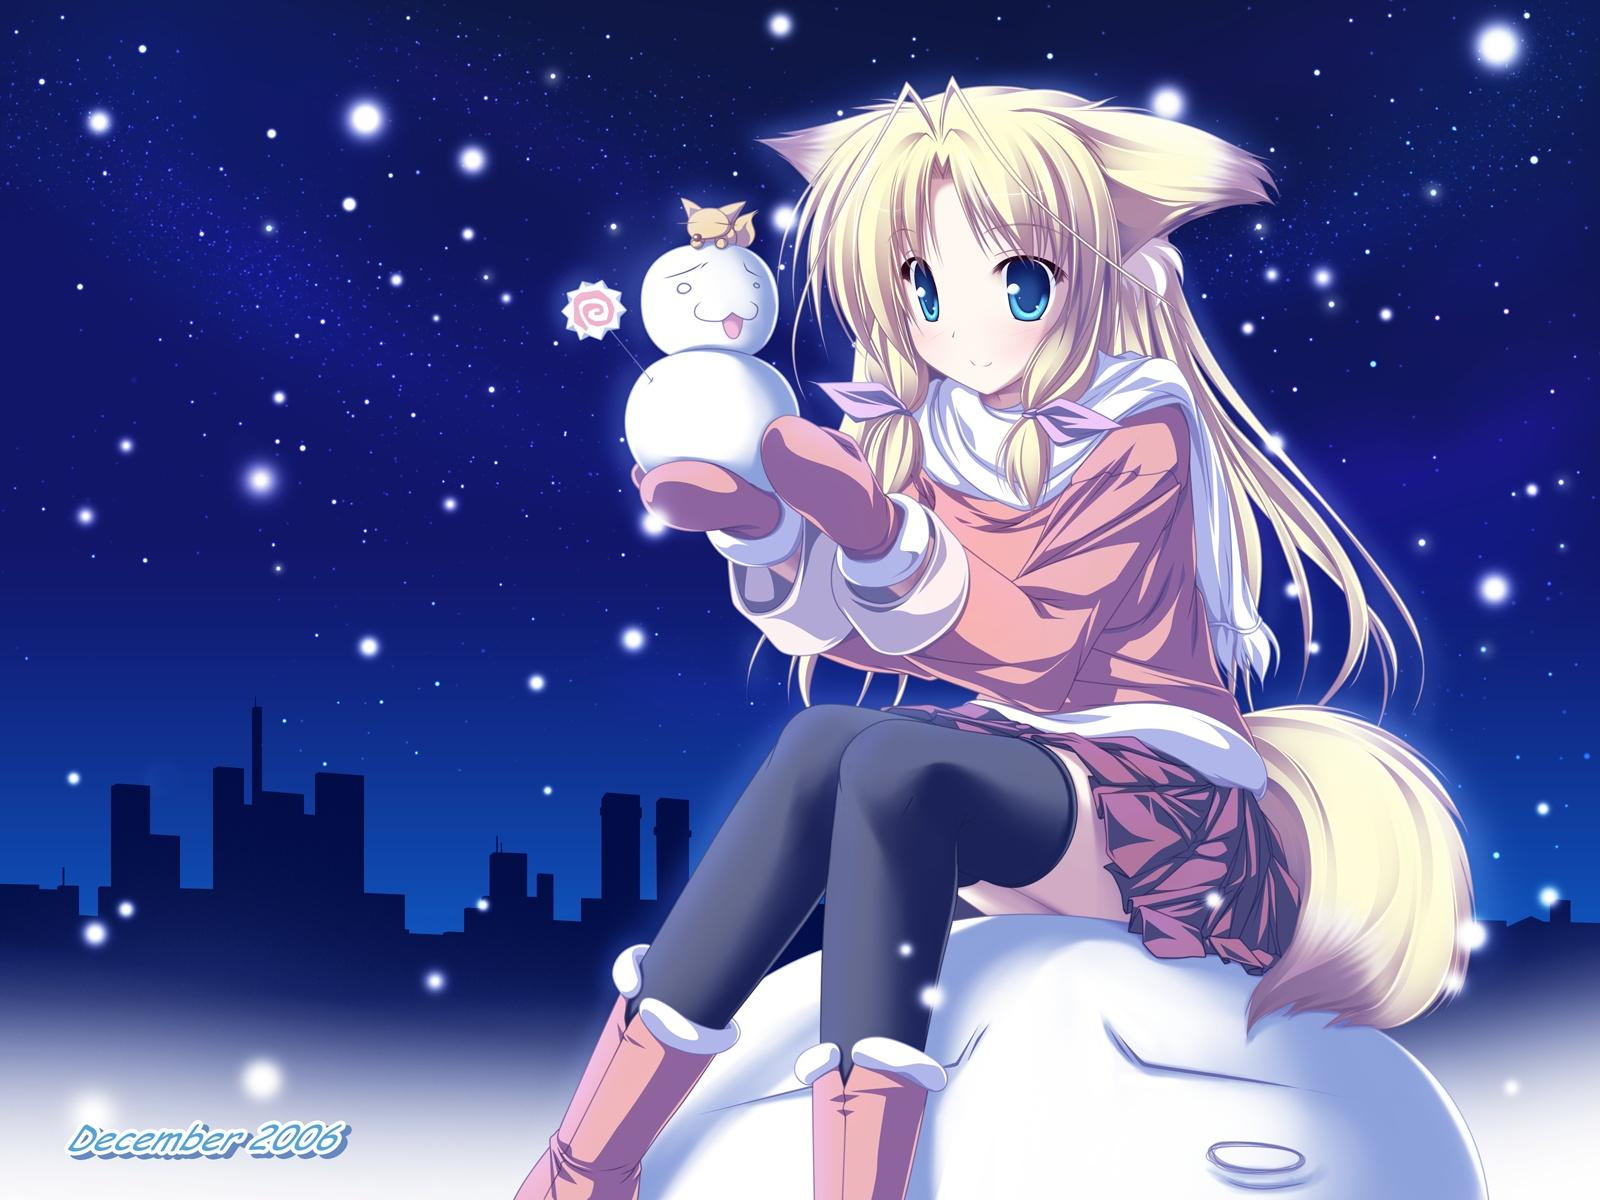 navidad anime wallpaper,cartoon,anime,sky,cg artwork,illustration